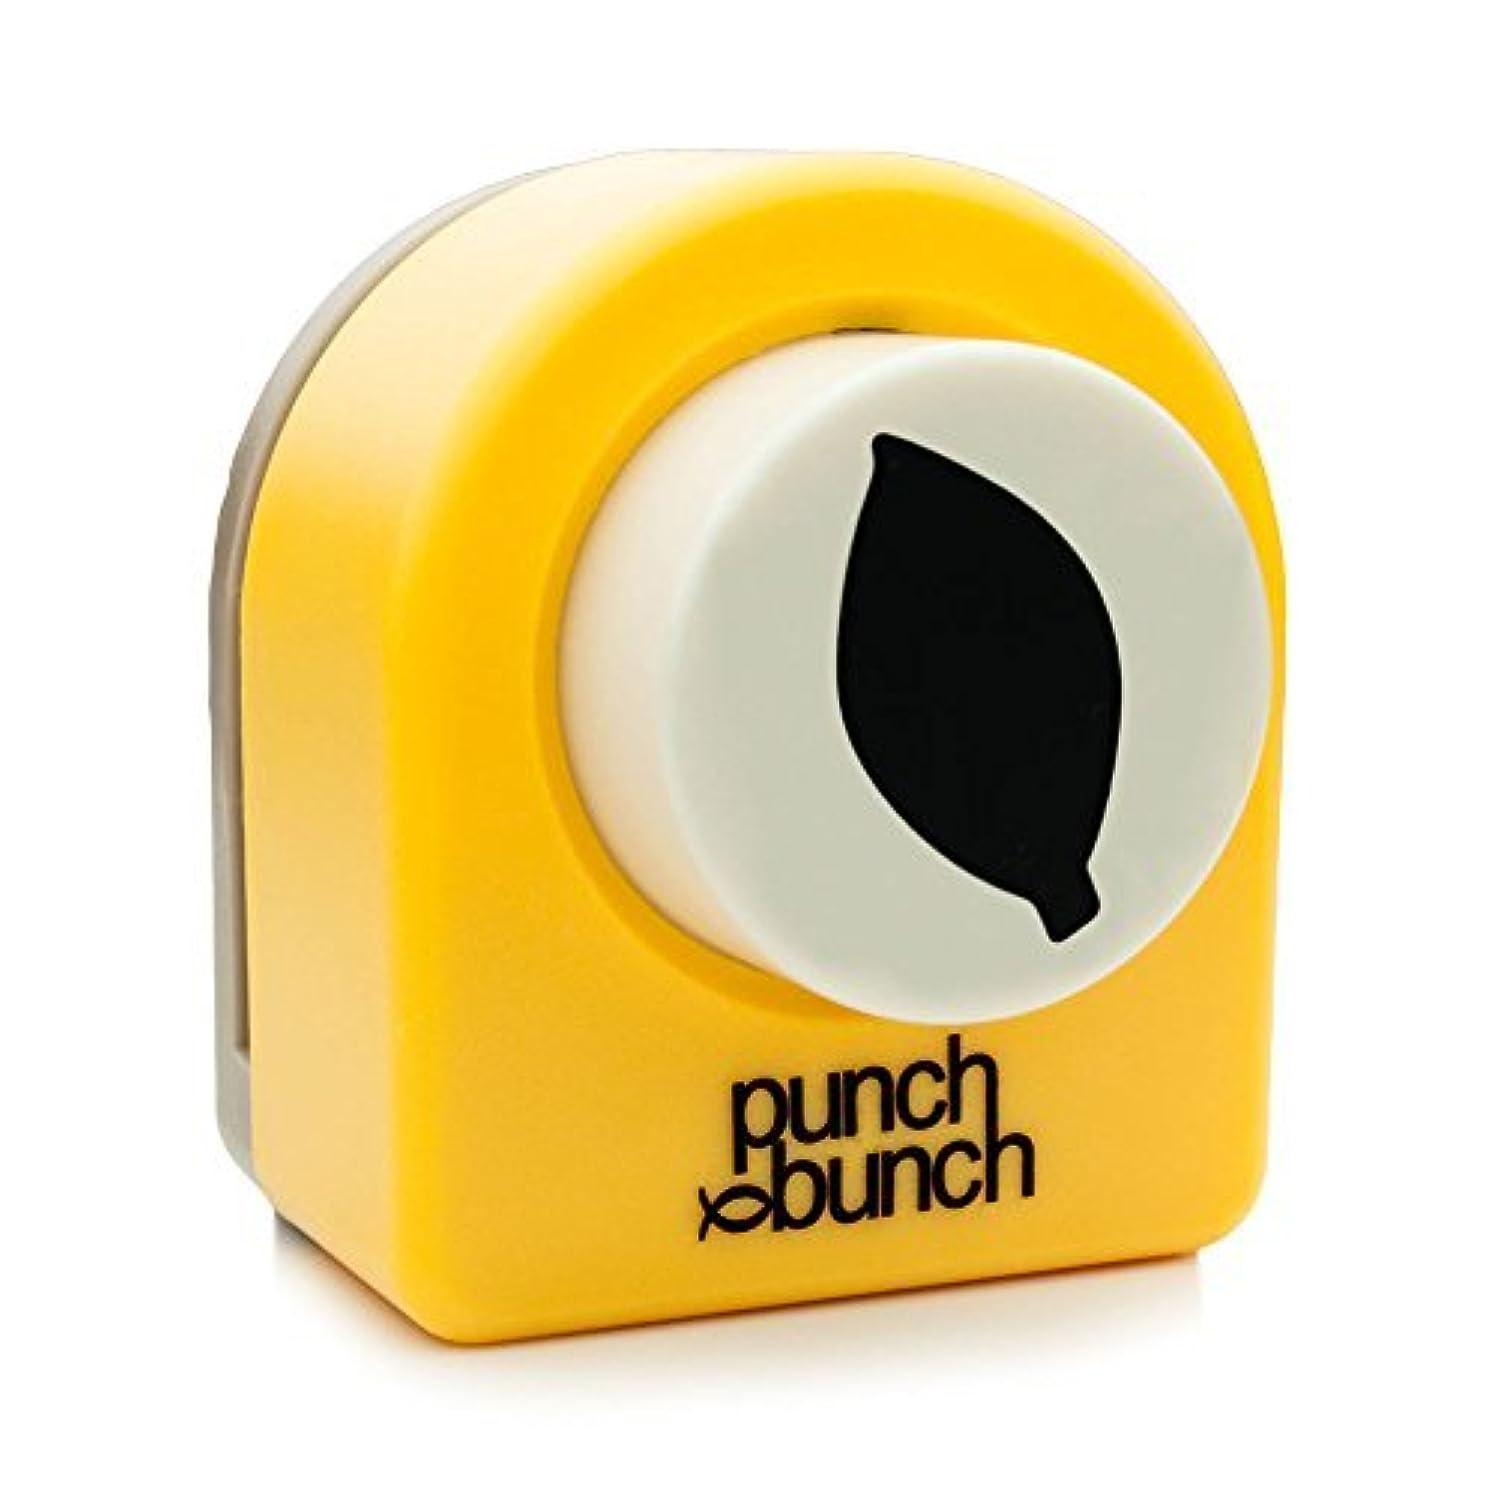 Punch Bunch Large Punch, Laurel Leaf